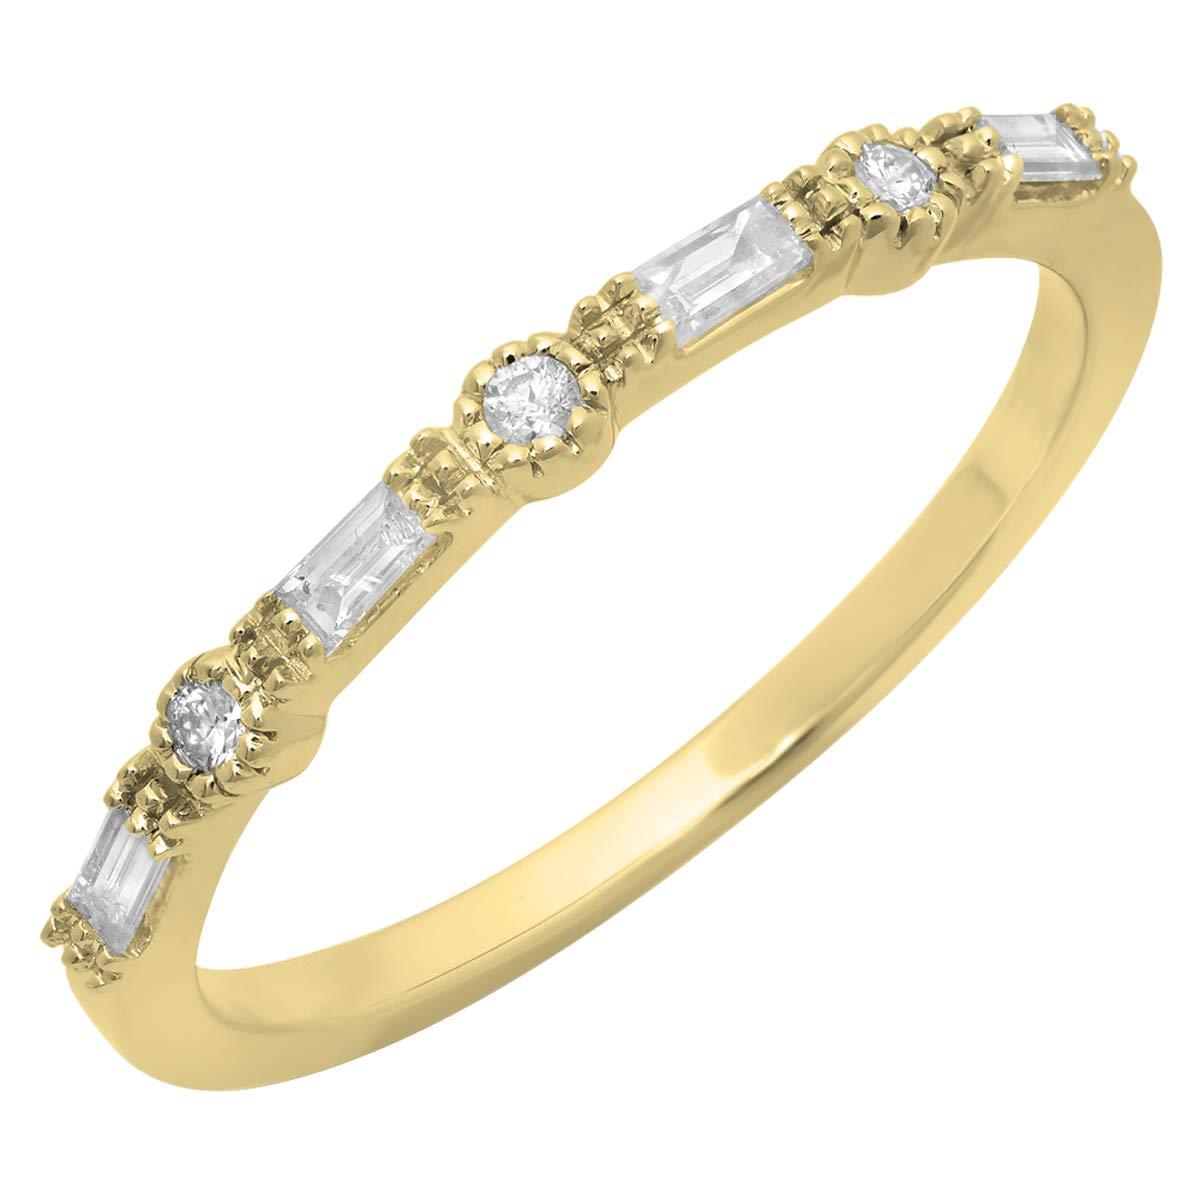 Dazzlingrock Collection 0.15 Carat (ctw) 14K Round & Baguette Diamond Ladies Anniversary Wedding Band, Yellow Gold, Size 8.5